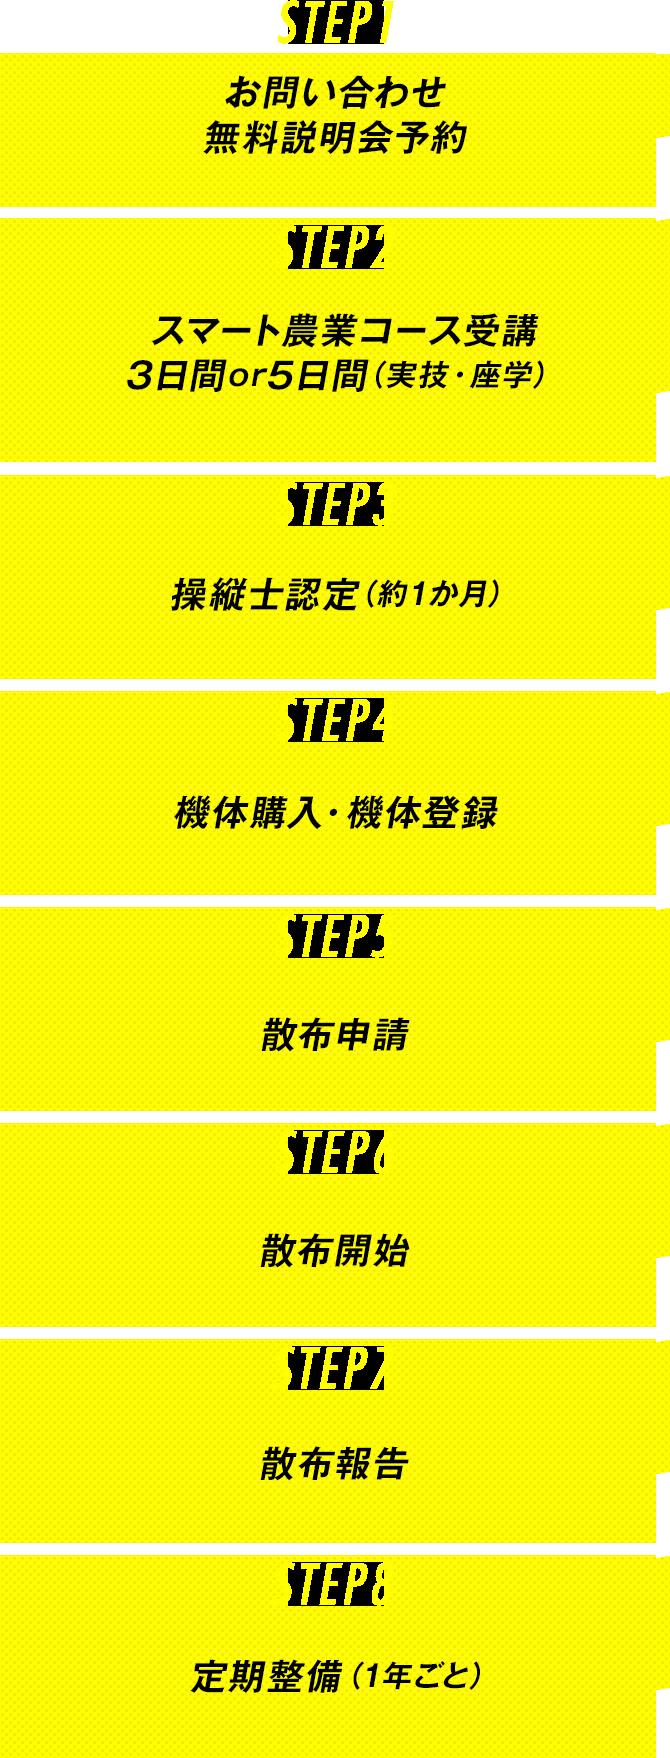 STEP1 お問い合わせ 無料説明会予約 STEP2 スマート農業コース受講3日間or5日間(実技・座学) STEP3 操縦士認定(約1か月)STEP4 機体購入・機体登録  STEP5 散布申請 STEP6 散布開始 STEP7 散布報告 STEP8 定期整備(1年ごと)